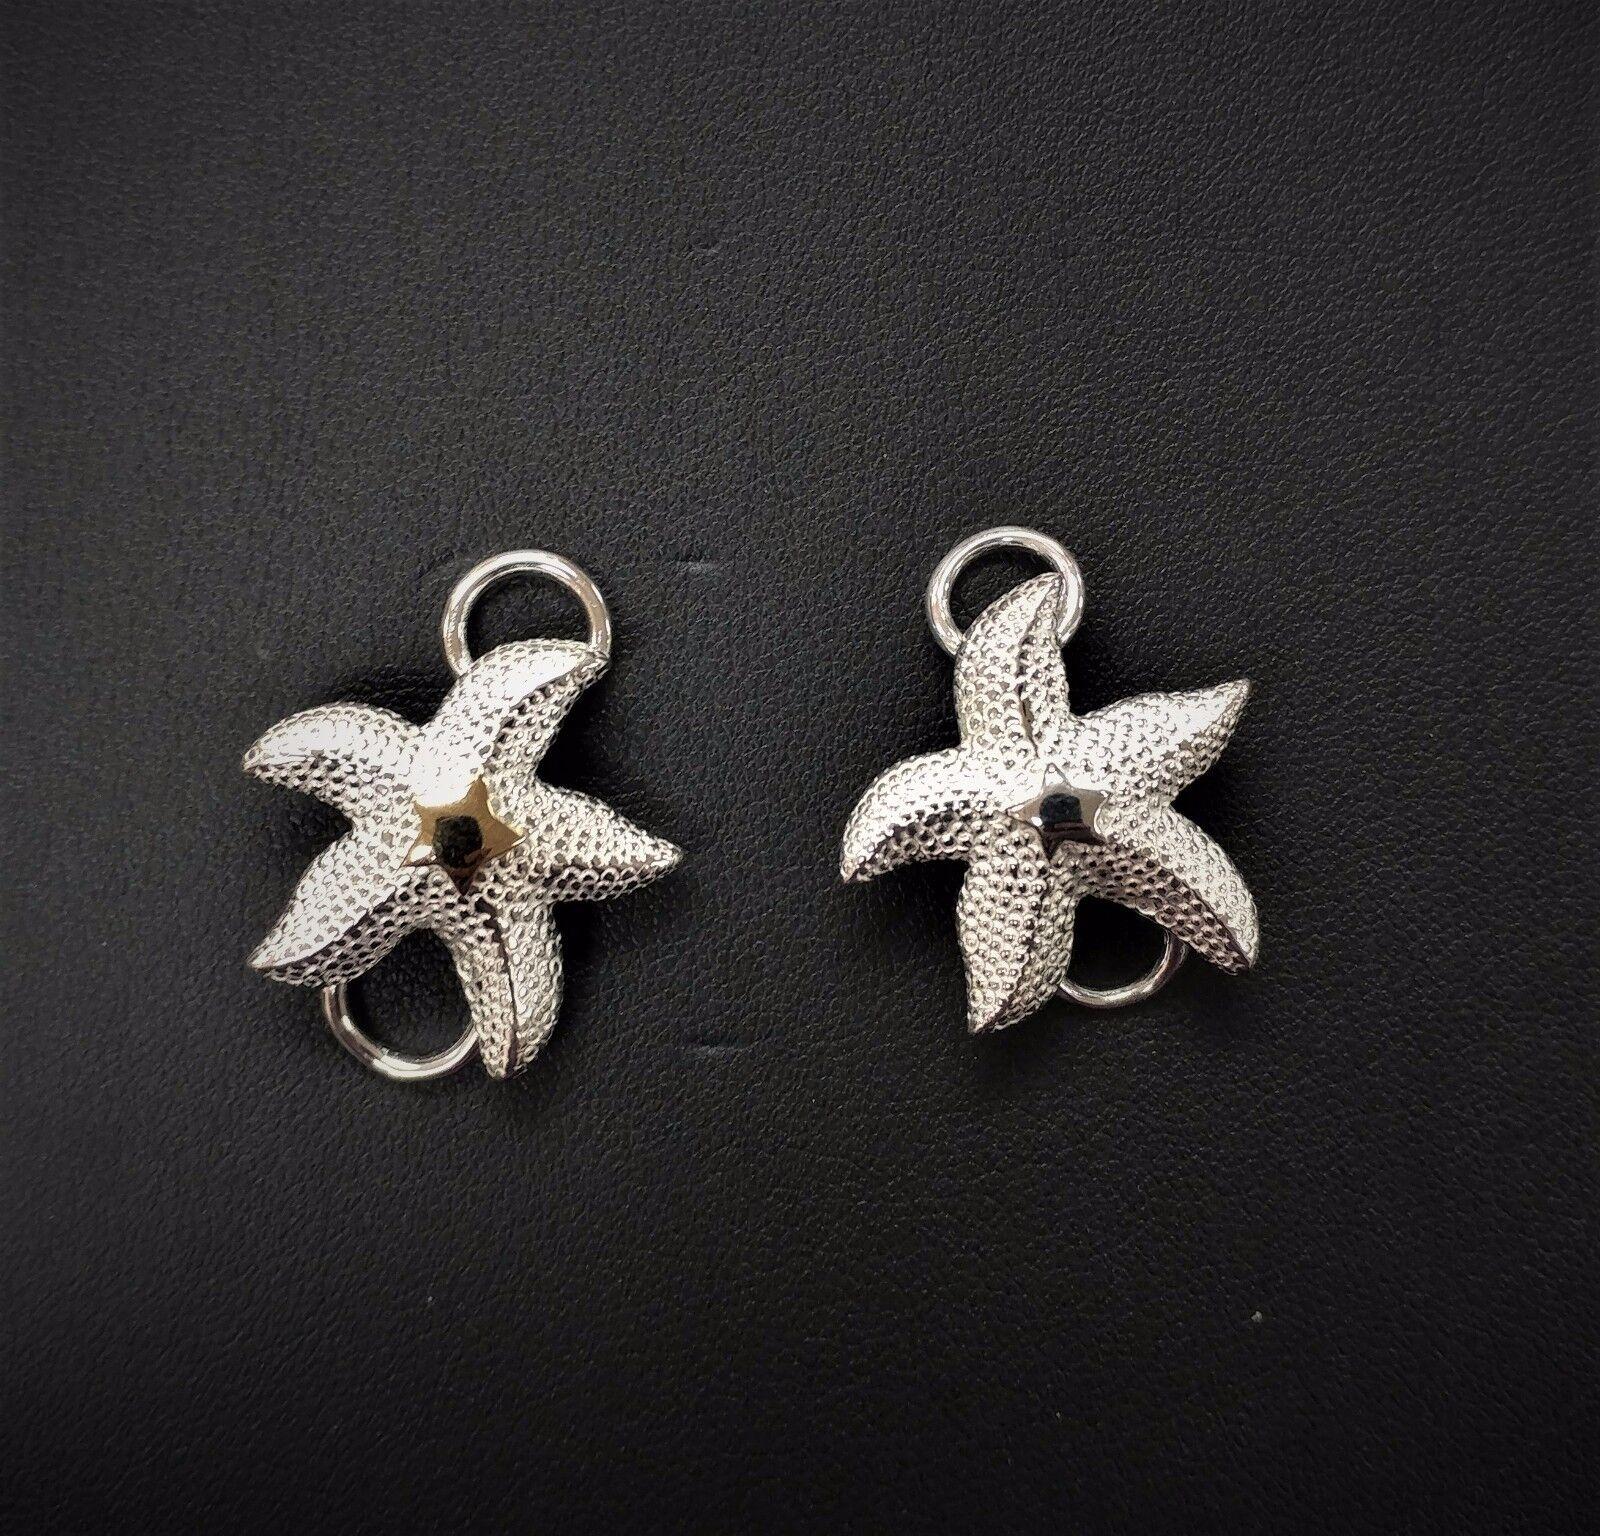 LeStage Congreenible Clasp - Starfish (SB ZB5624)